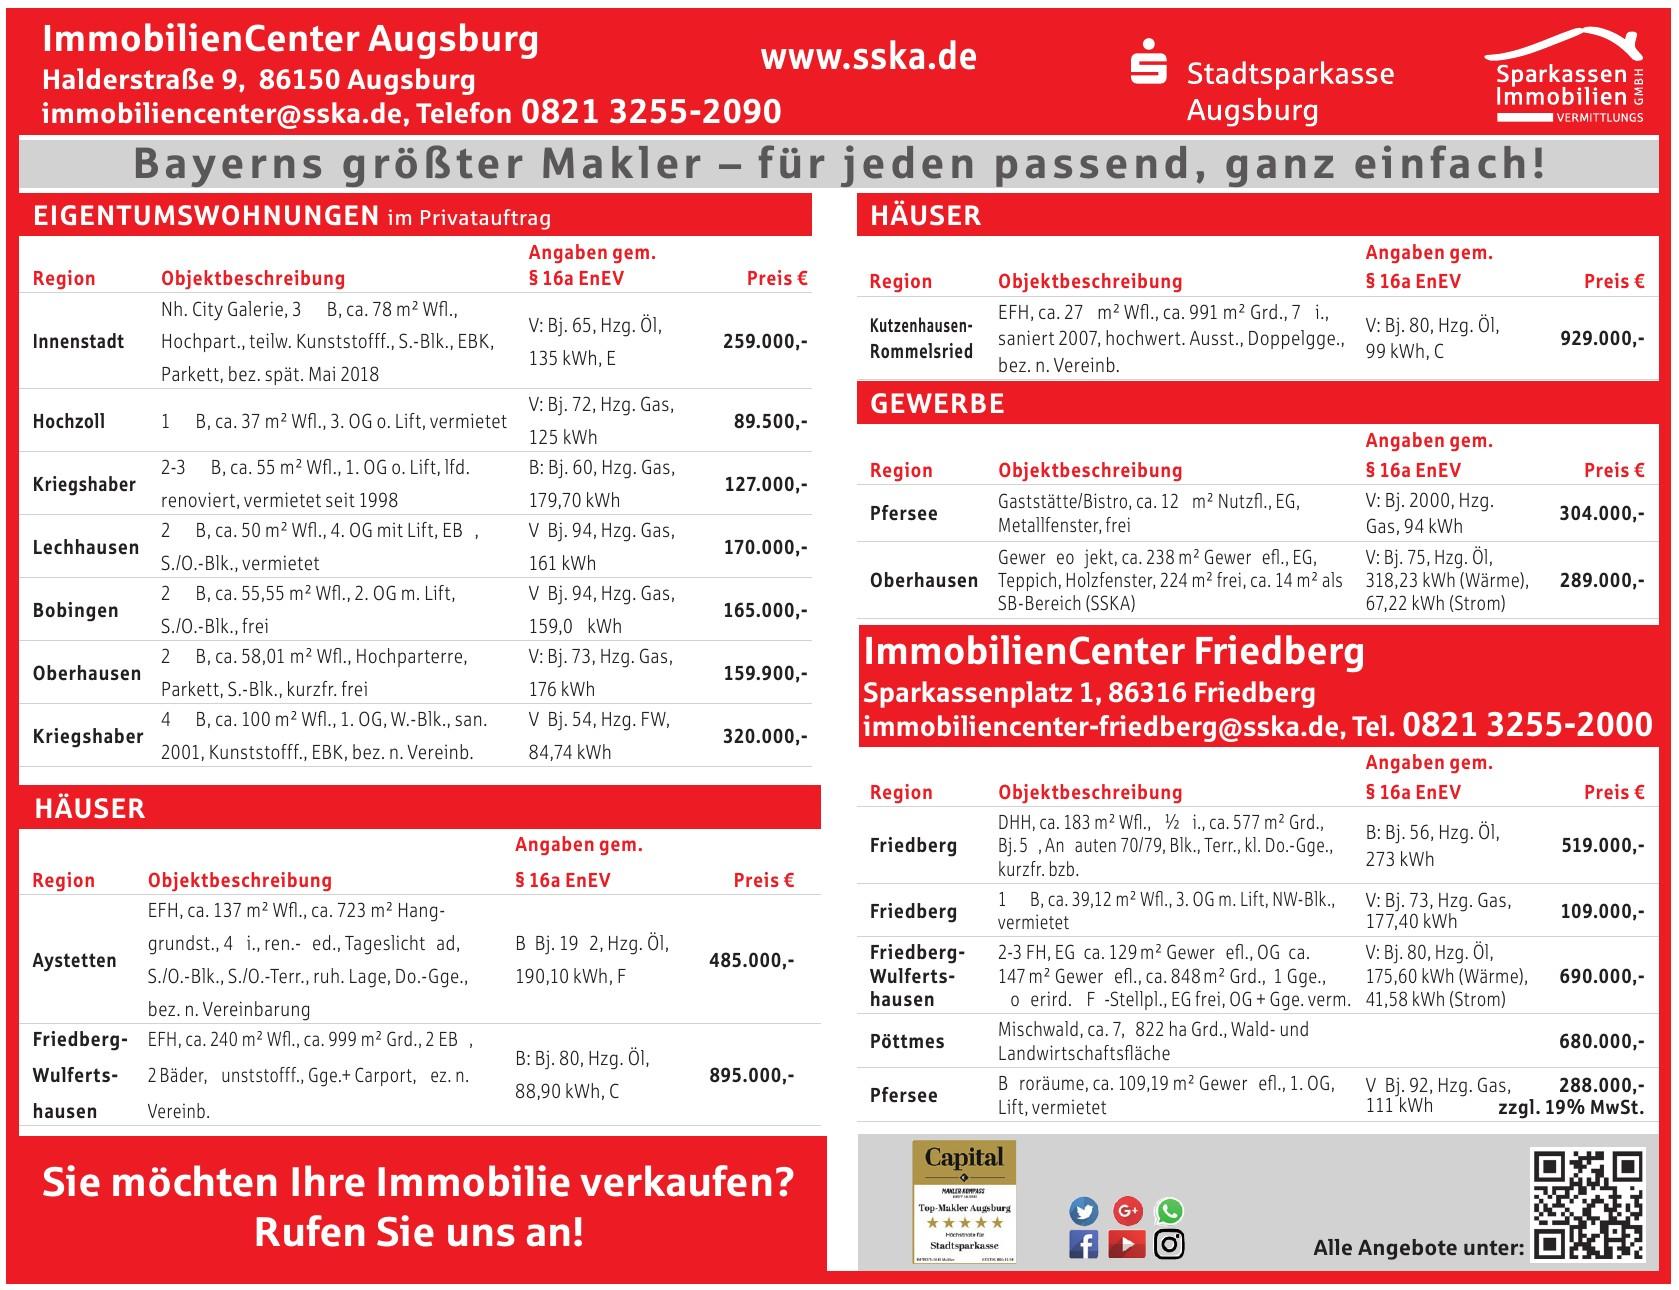 Immobilien Center Augsburg